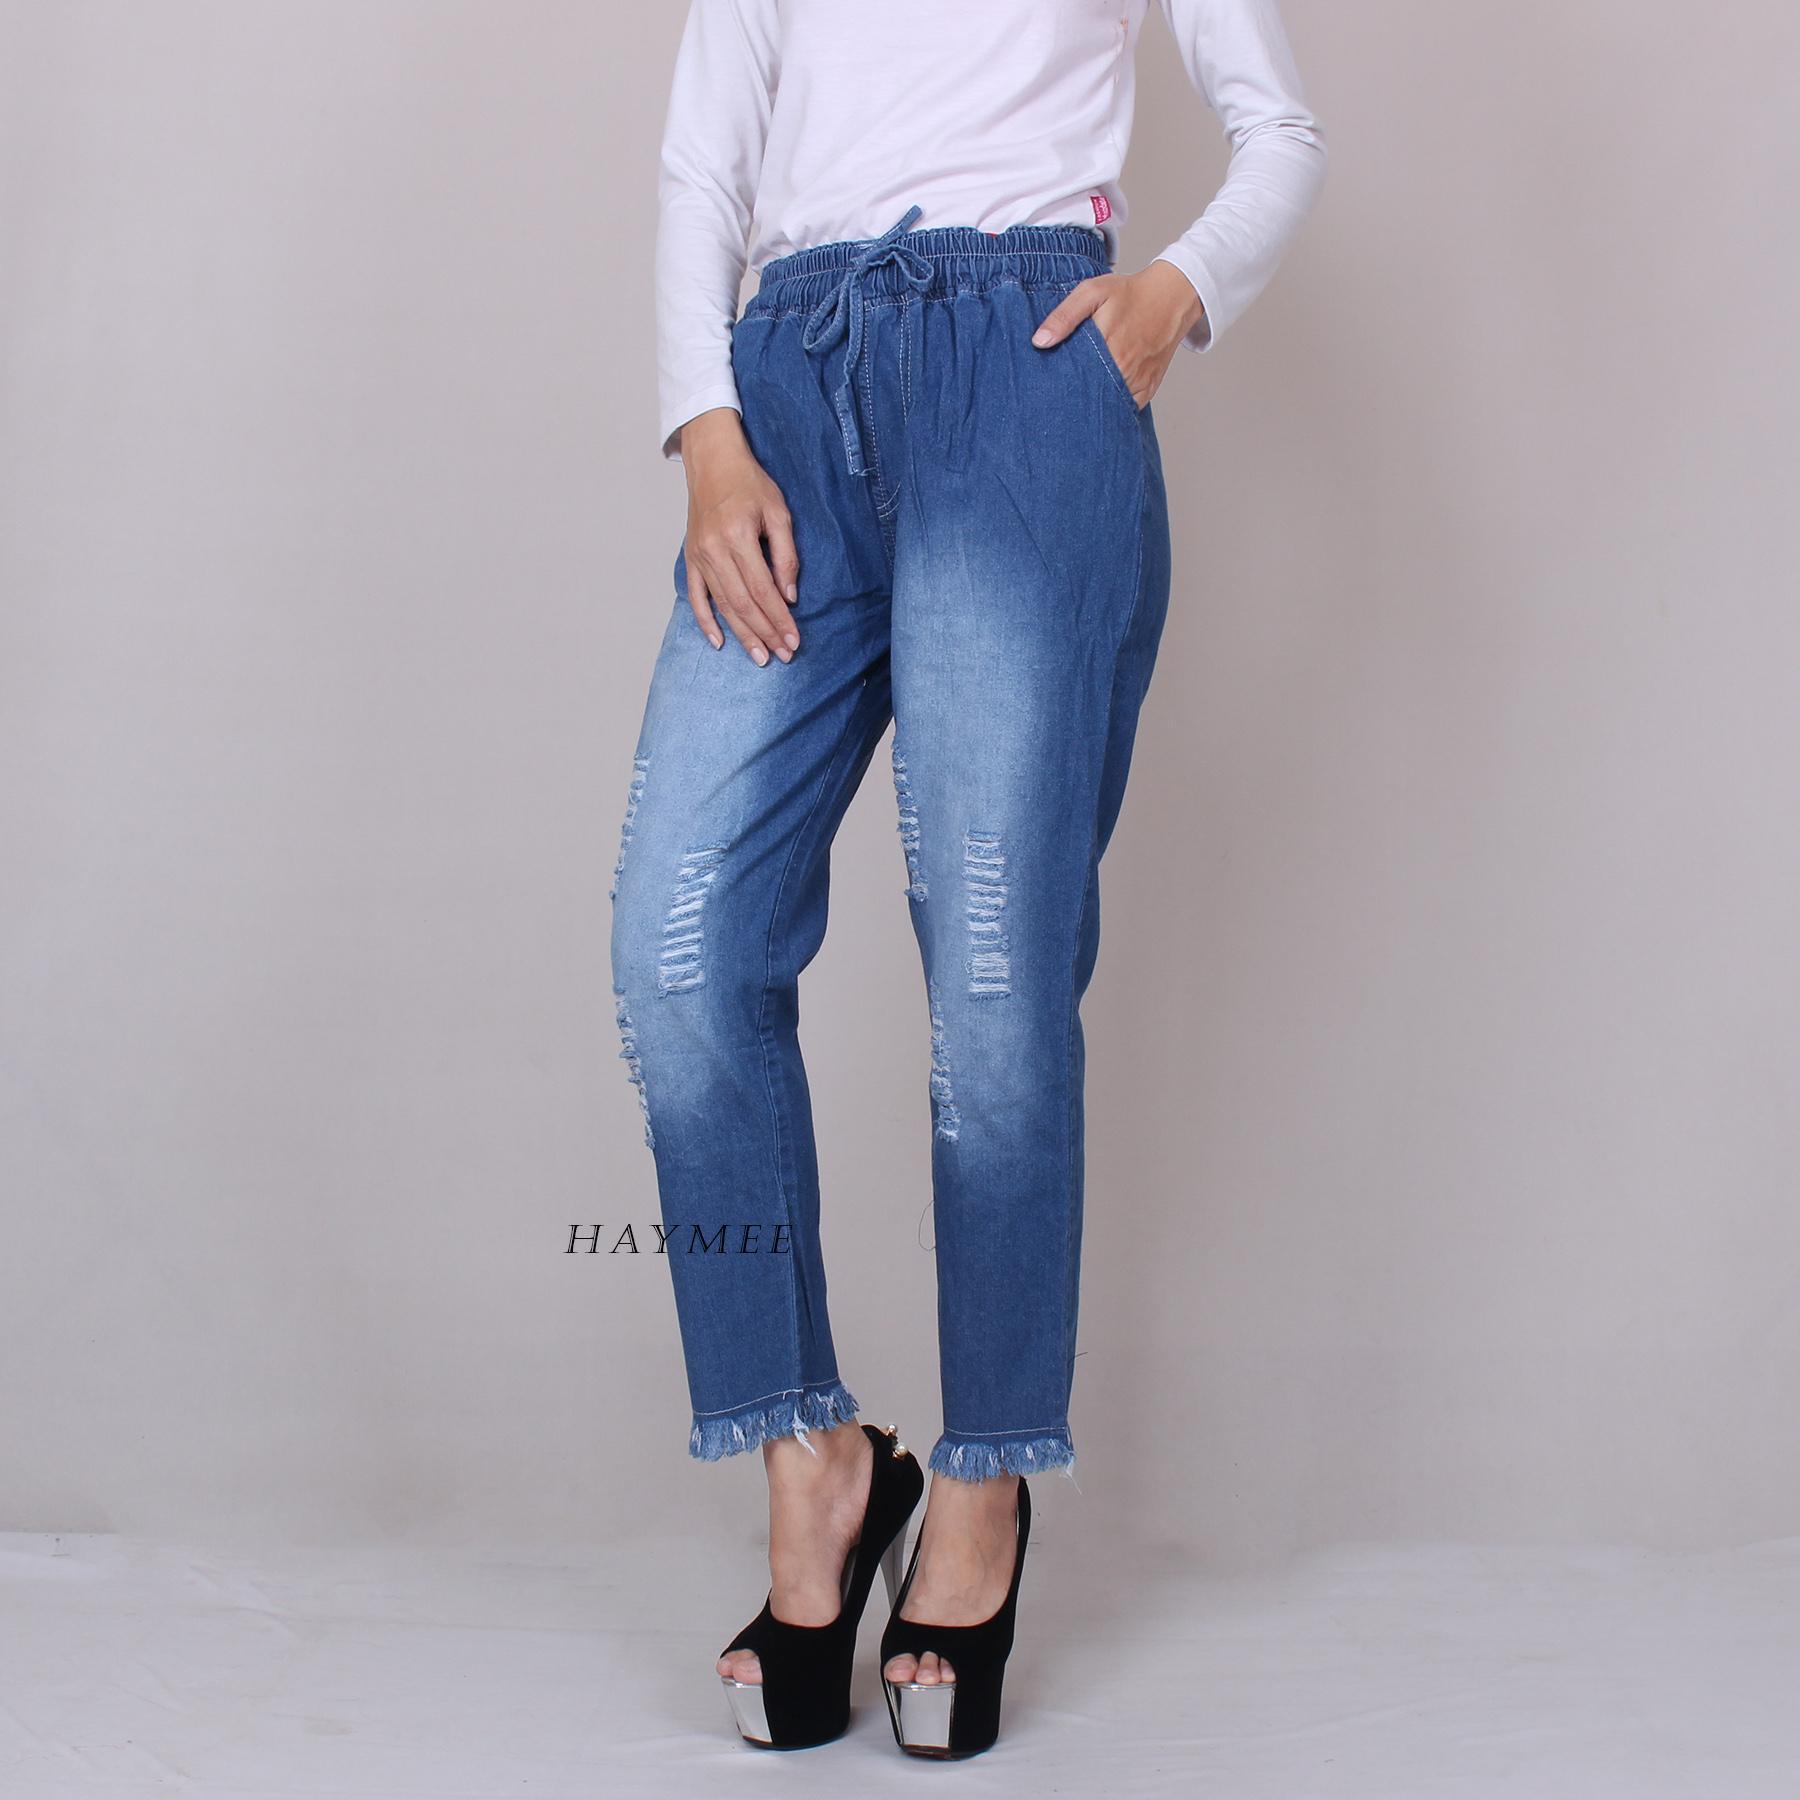 Haymeestore Celana Riwis Boyfriend Bawahan Jeans Wanita Celana Denim Wanita Motif Sobek Blue